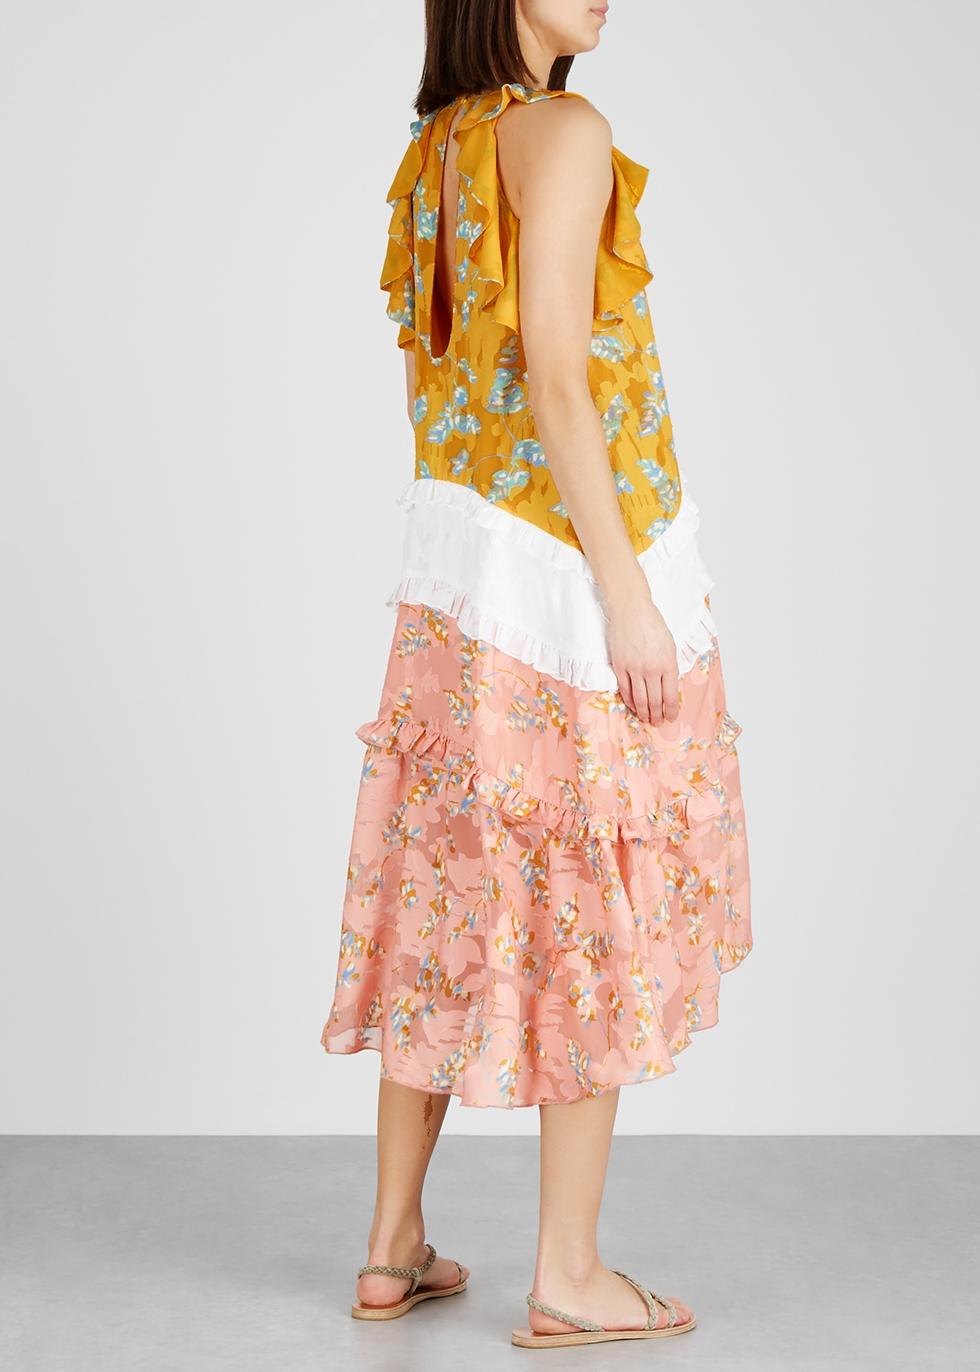 Flower Child printed chiffon dress - THREE FLOOR